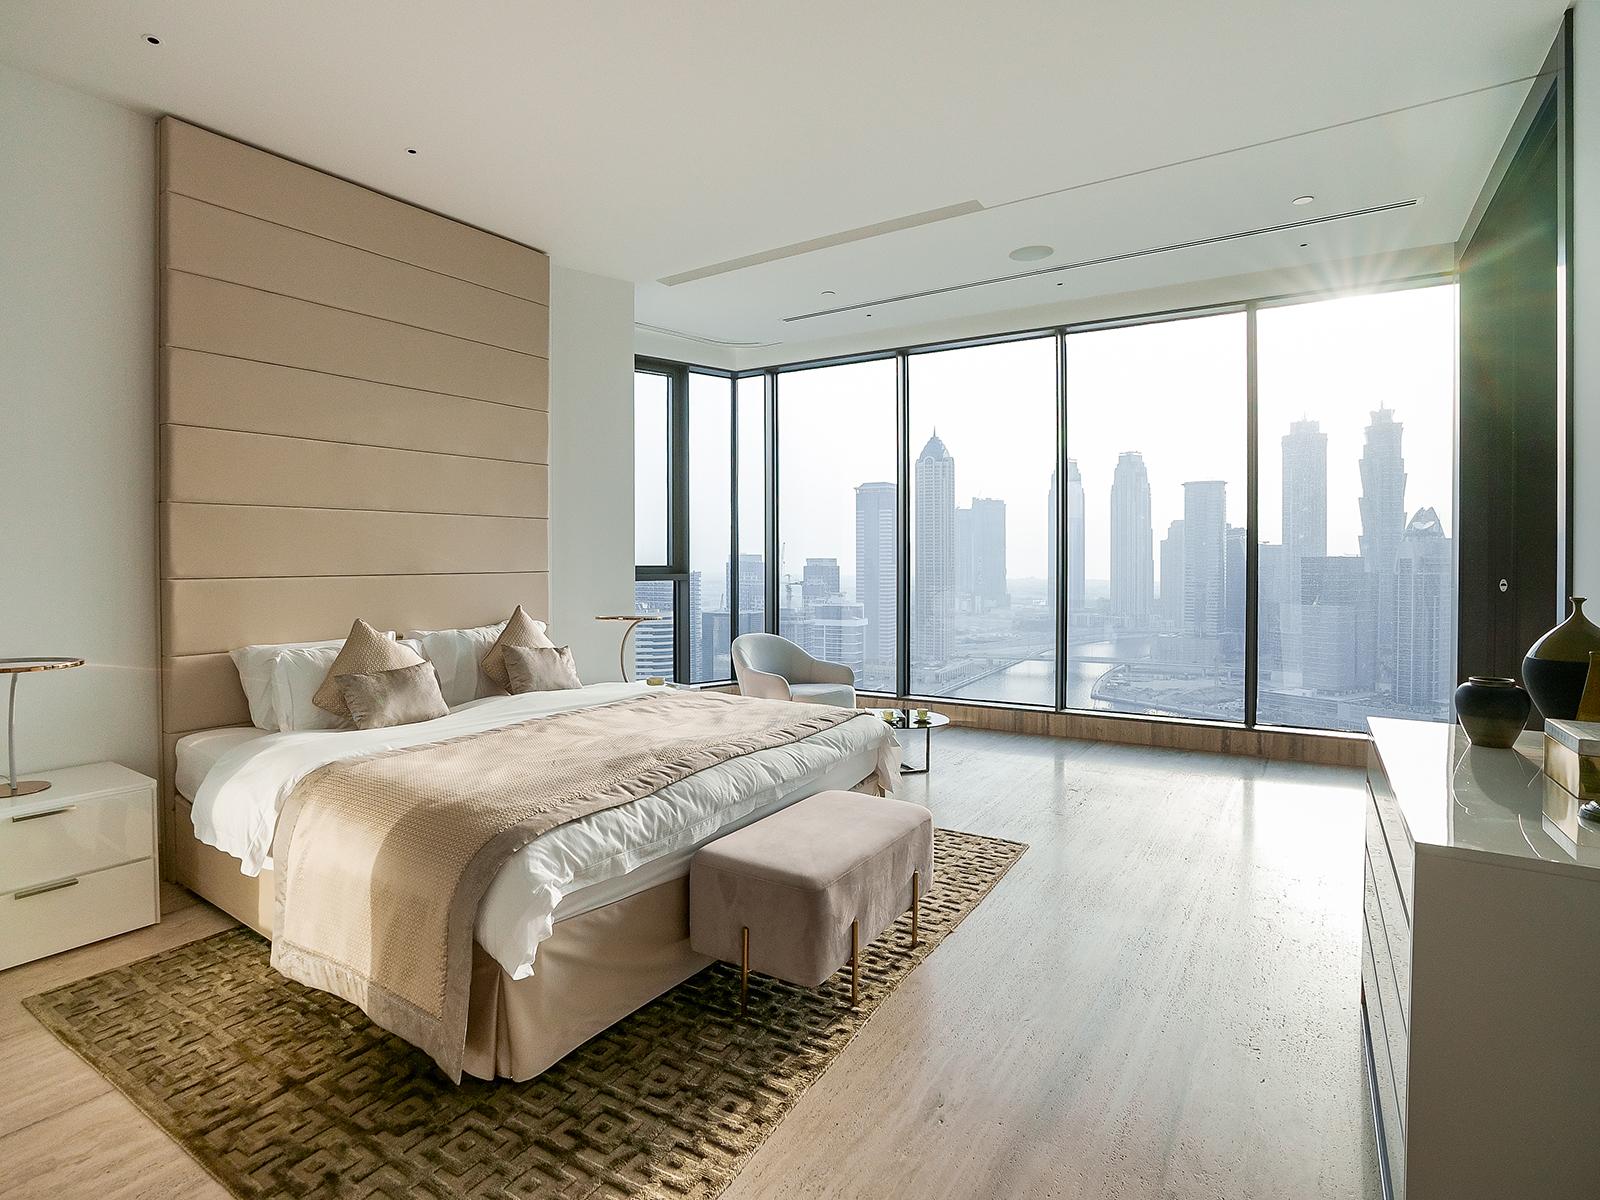 A penthouse bedroom with views of the Dubai skyline